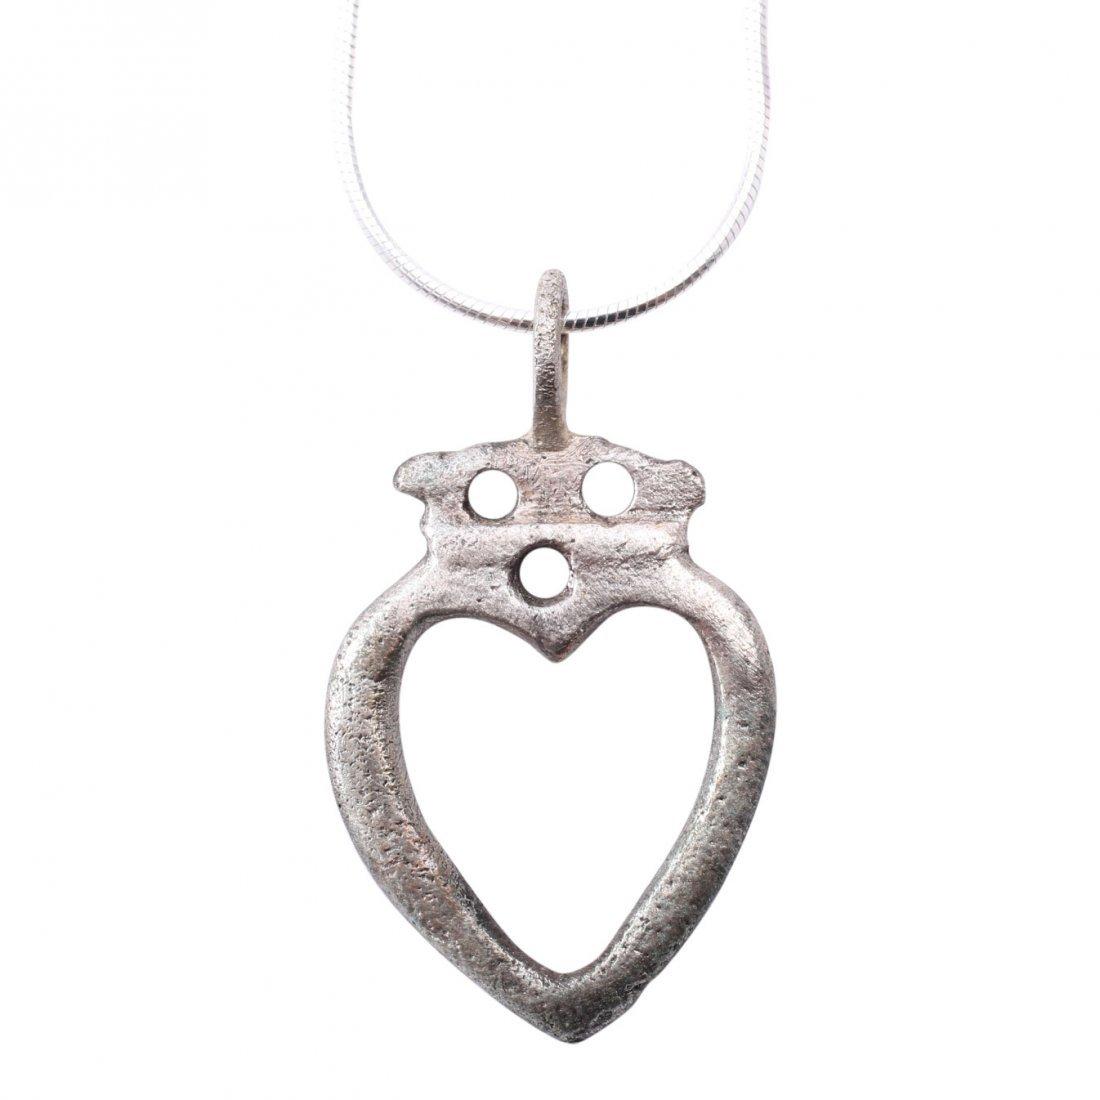 Extraordinary Viking Crowned Heart Pendant 10-11th C